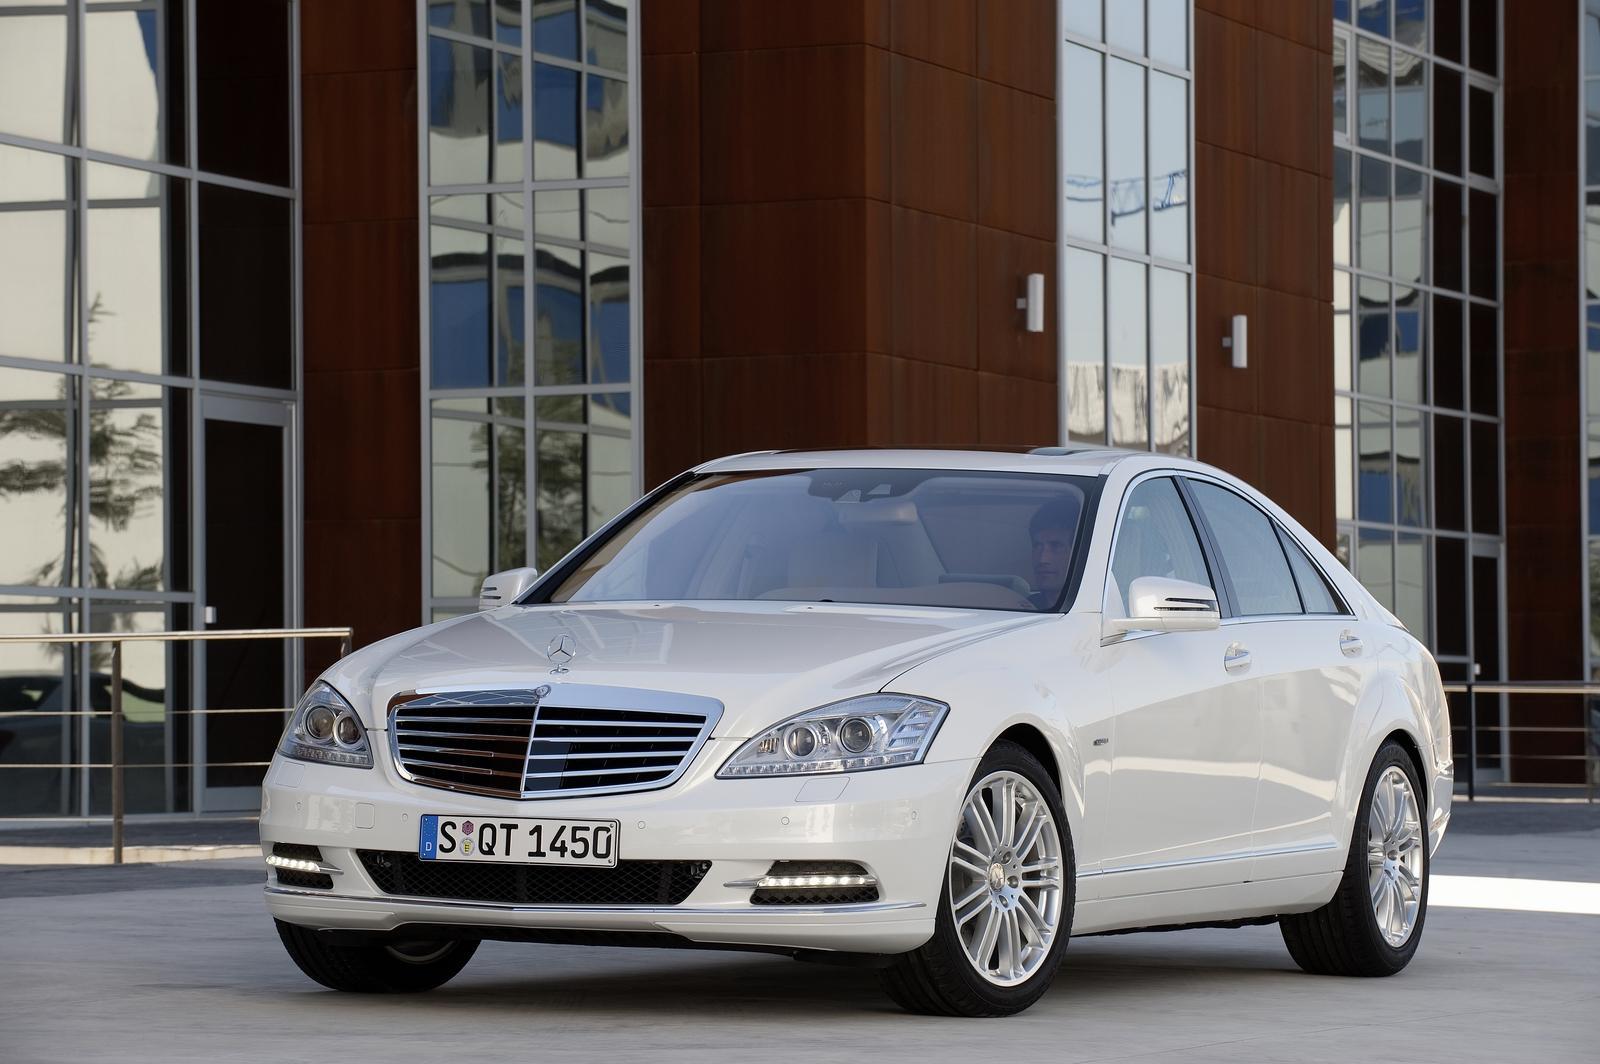 2012 world green car award mercedes s 250 drive for Mercedes benz s250